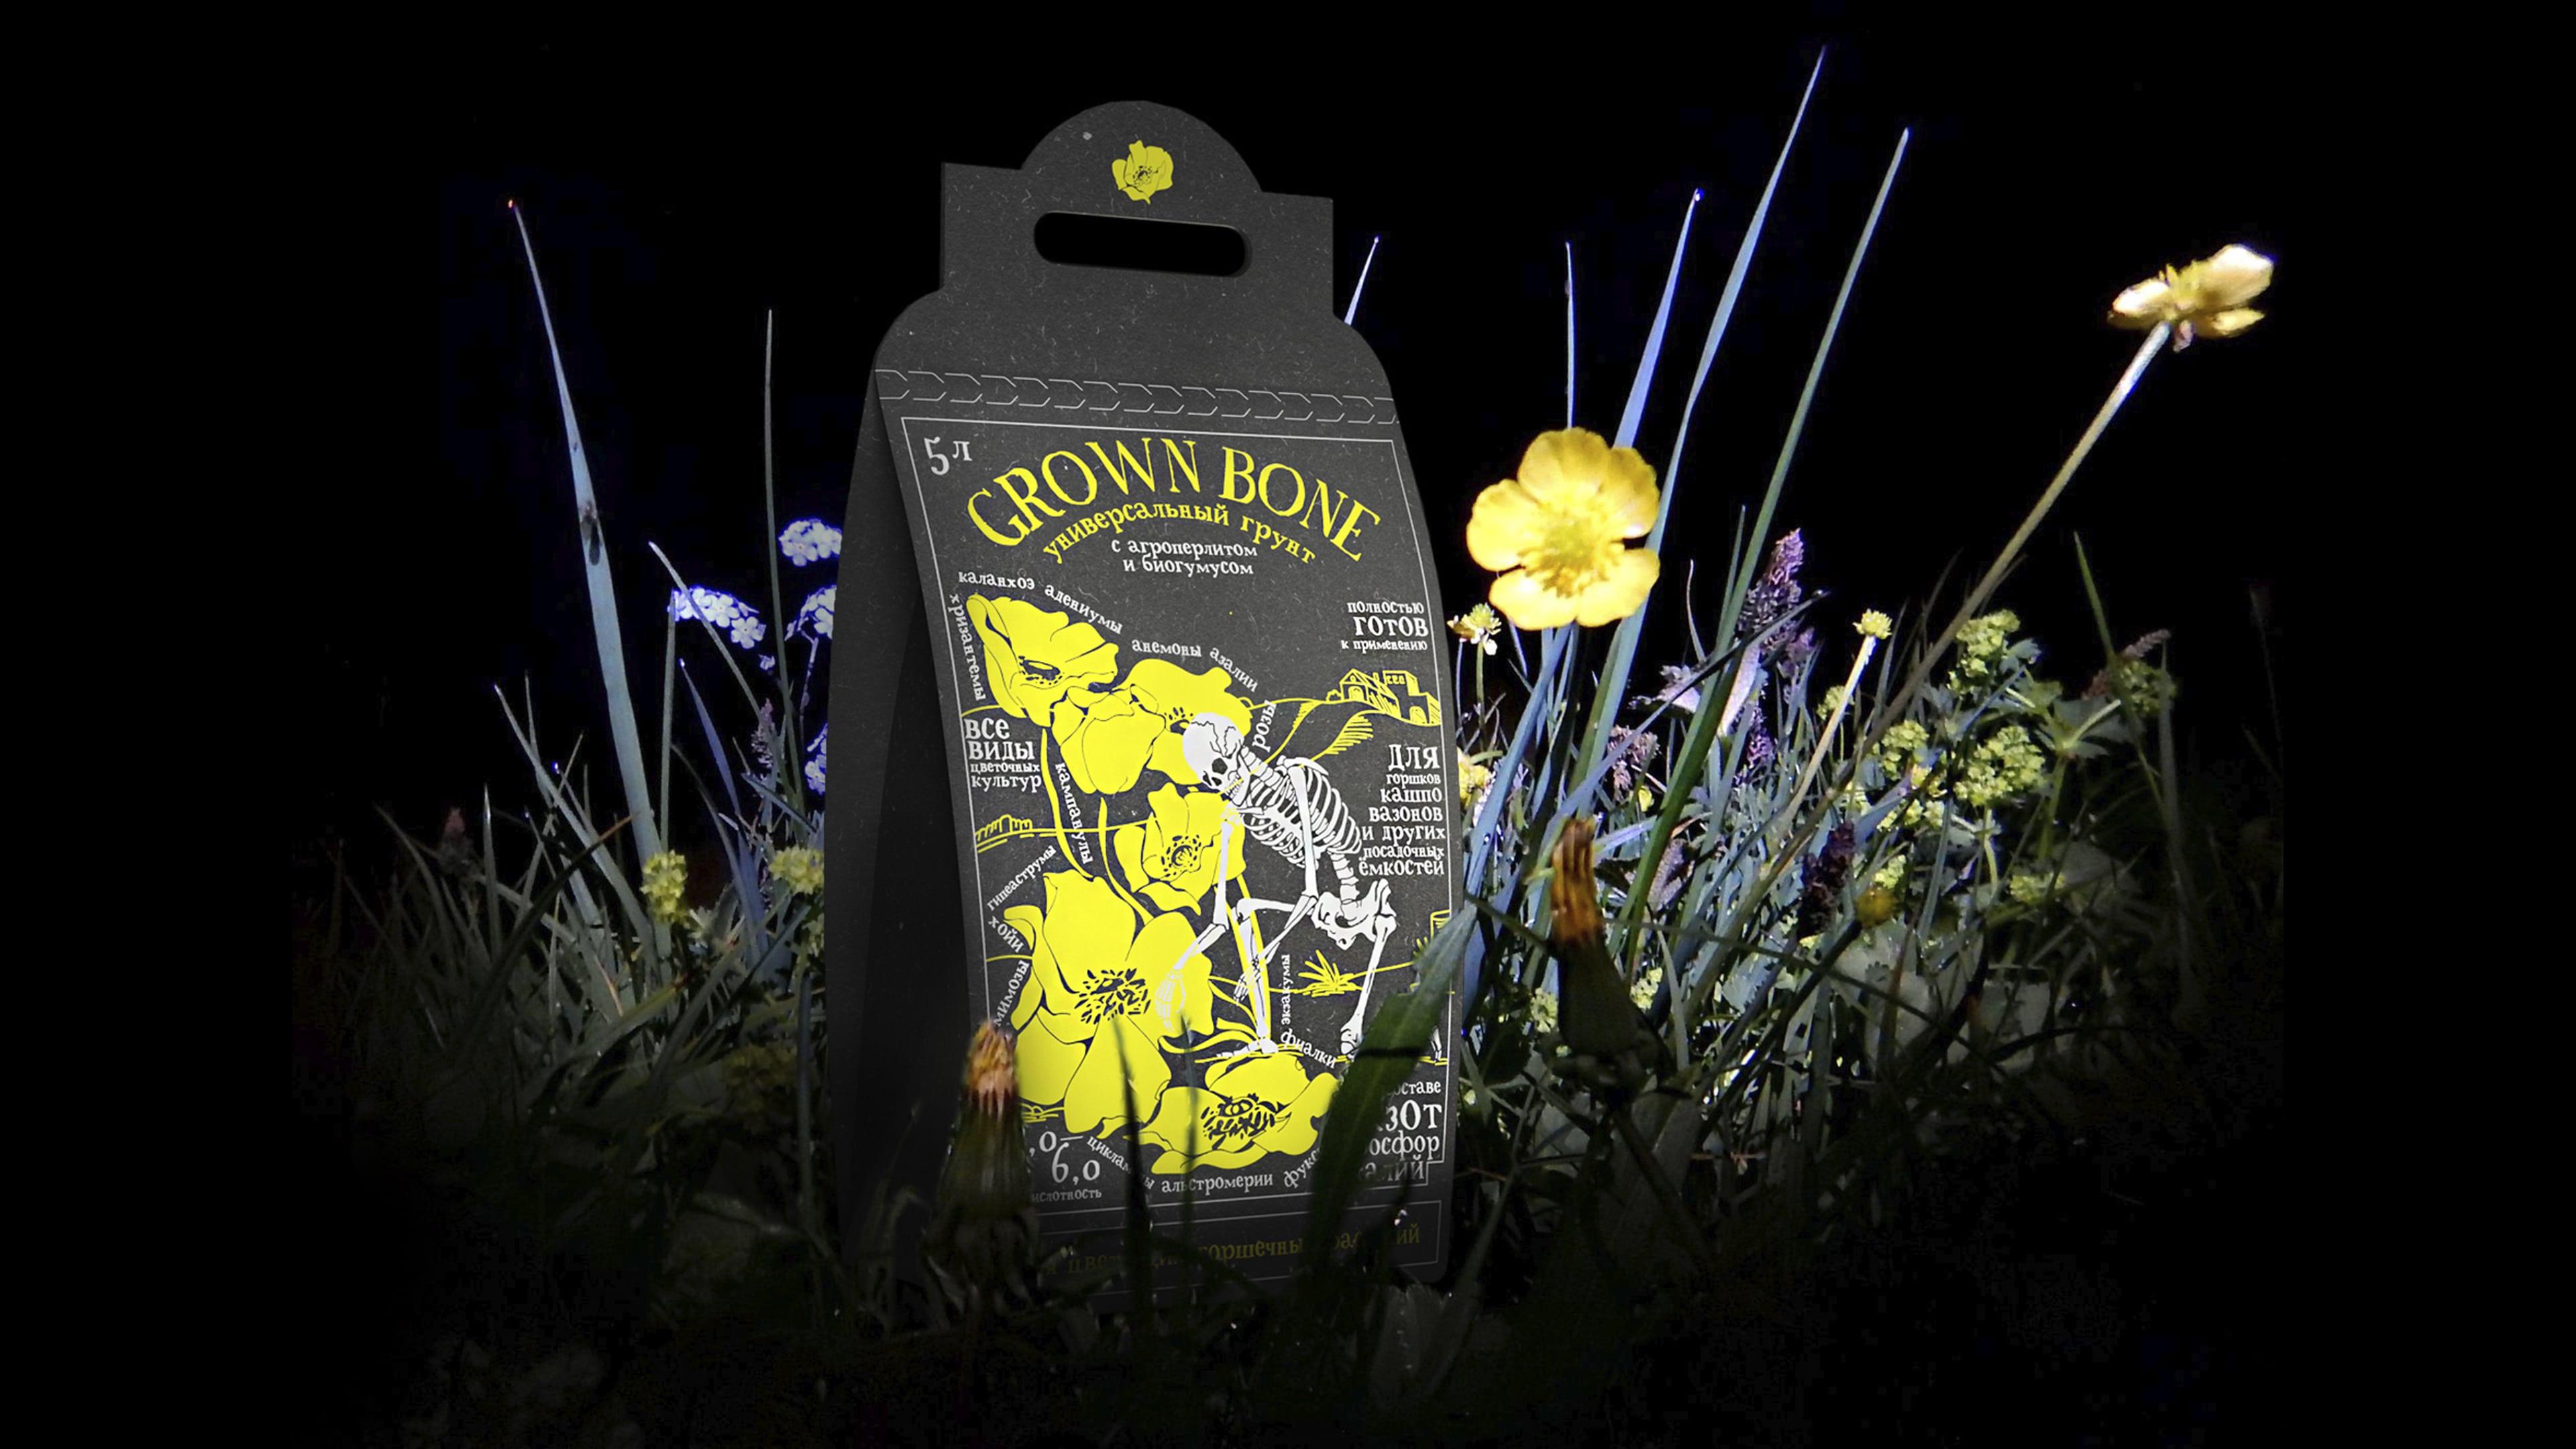 Student Svetlana Korotkikh Creates Grown Bone Concept for an Unusual Brand of Topsoil